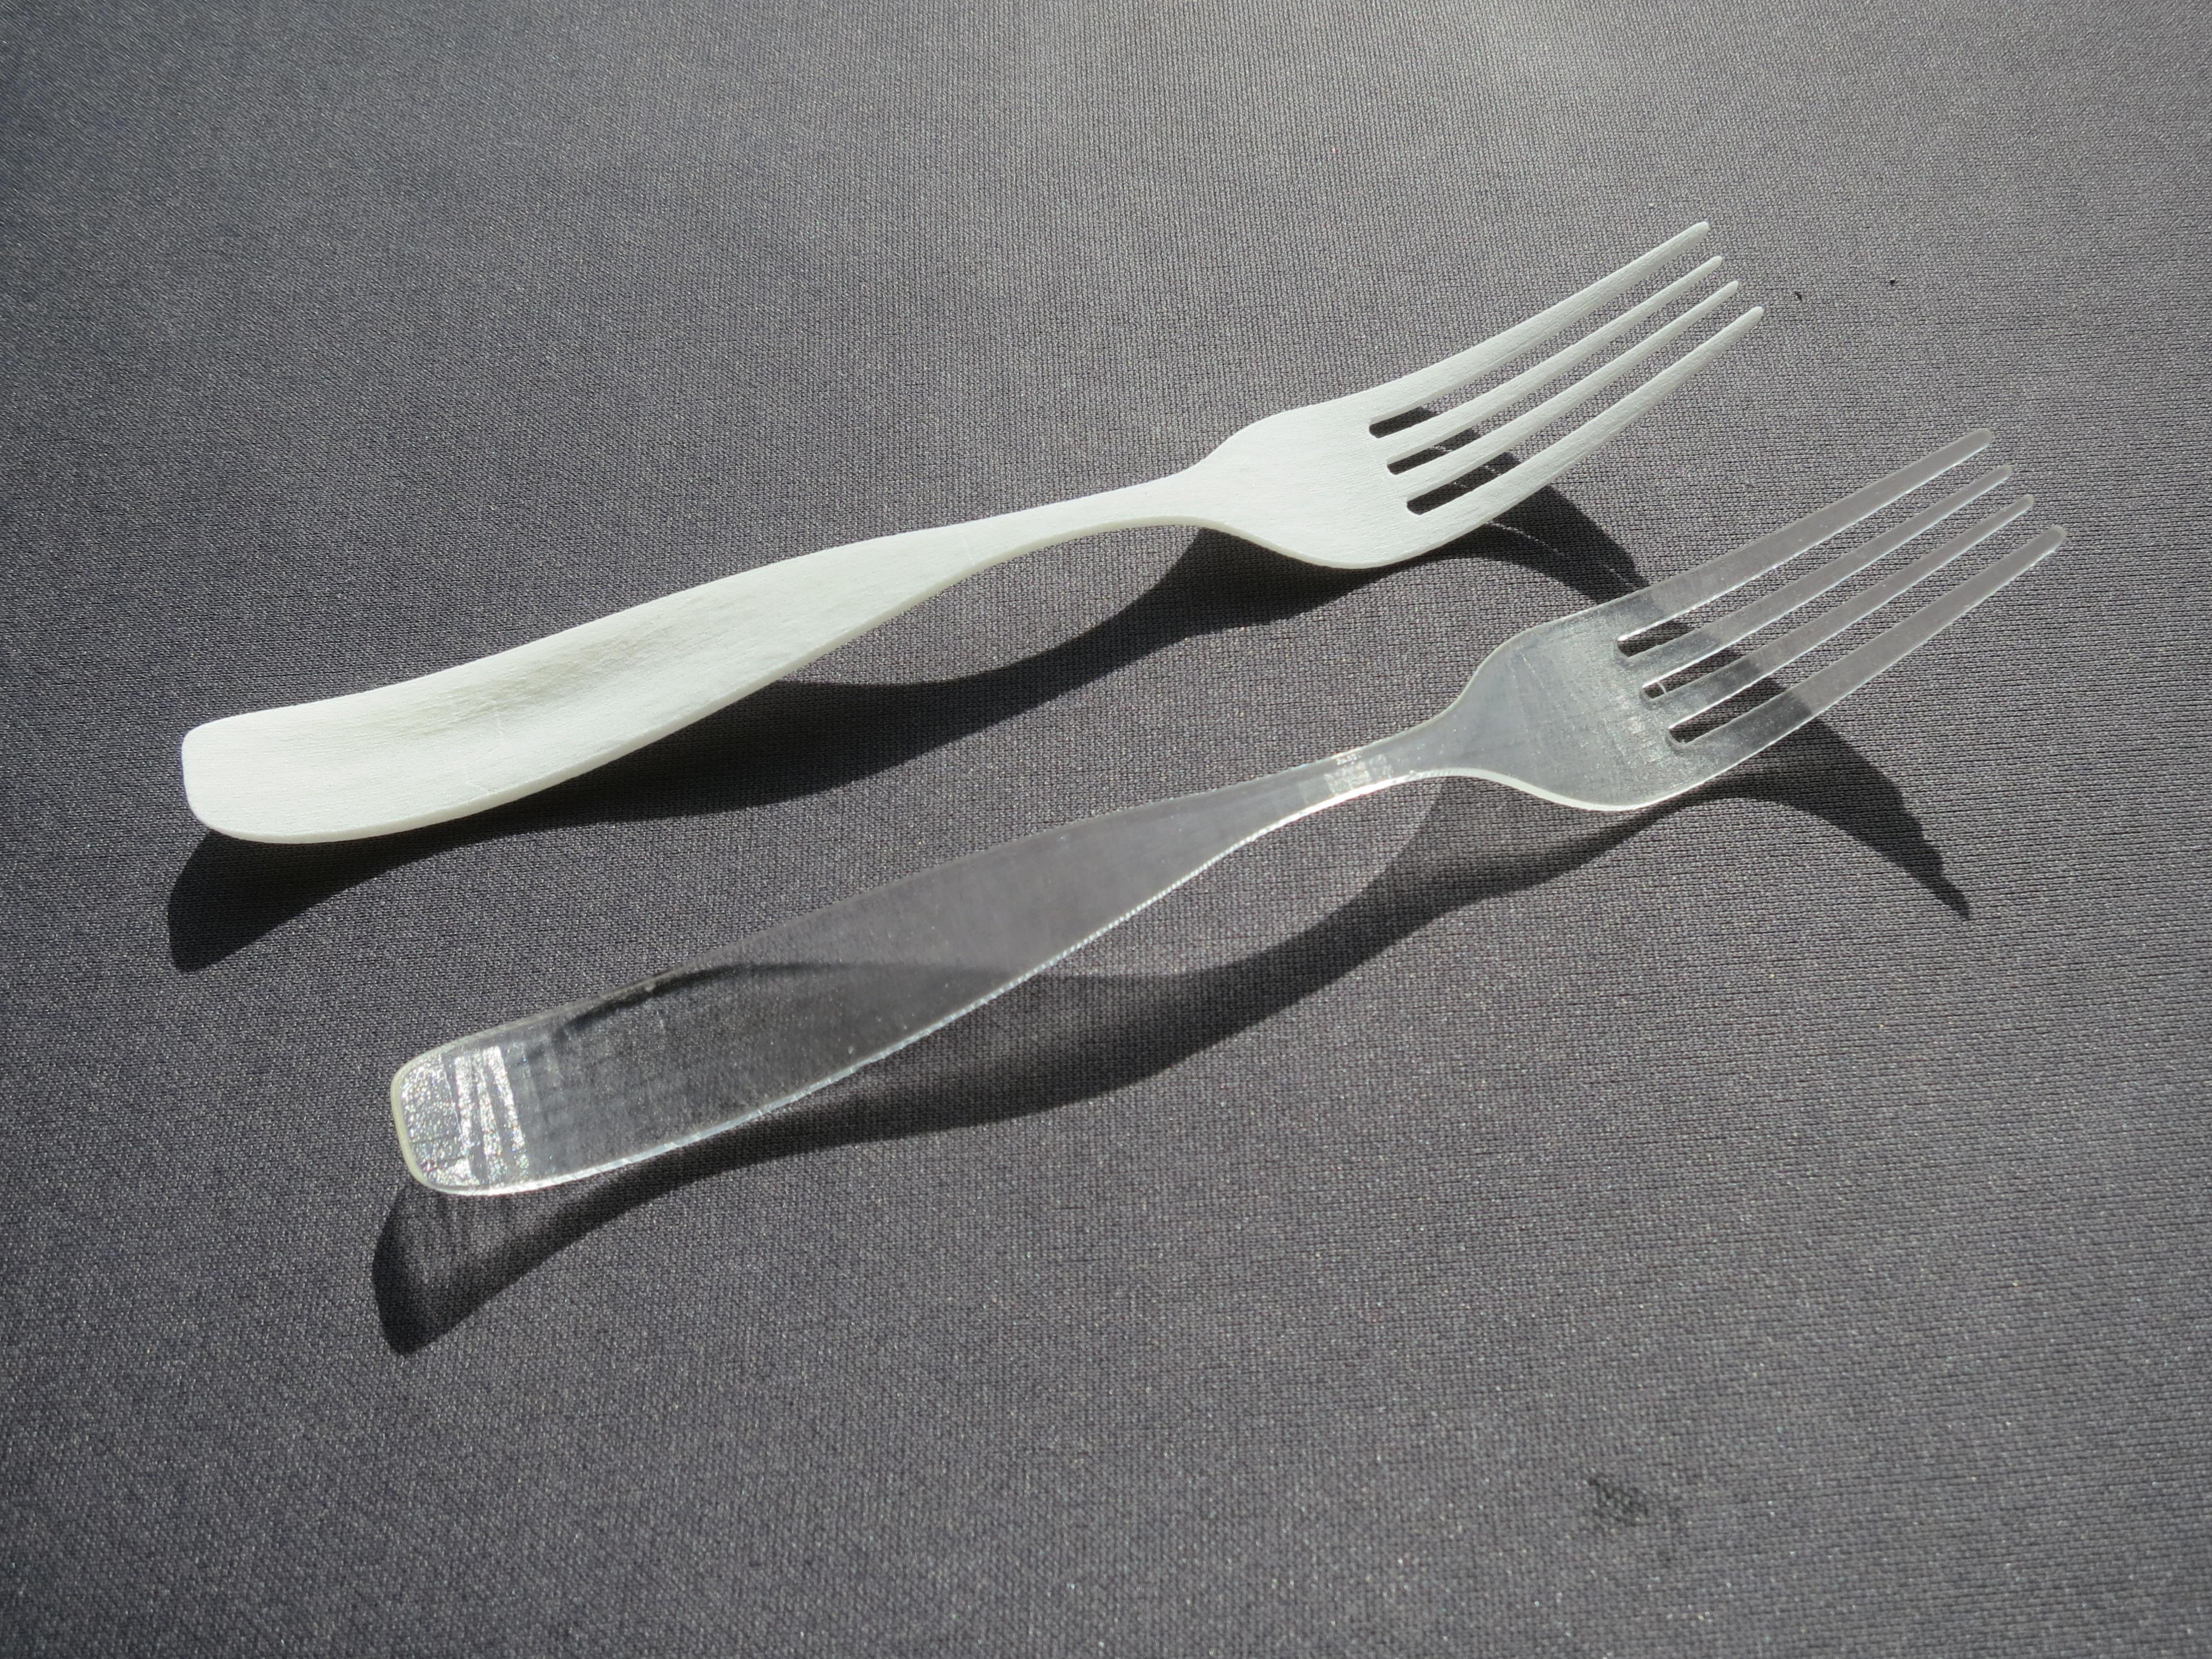 3D modeling a Fork for 3D printing